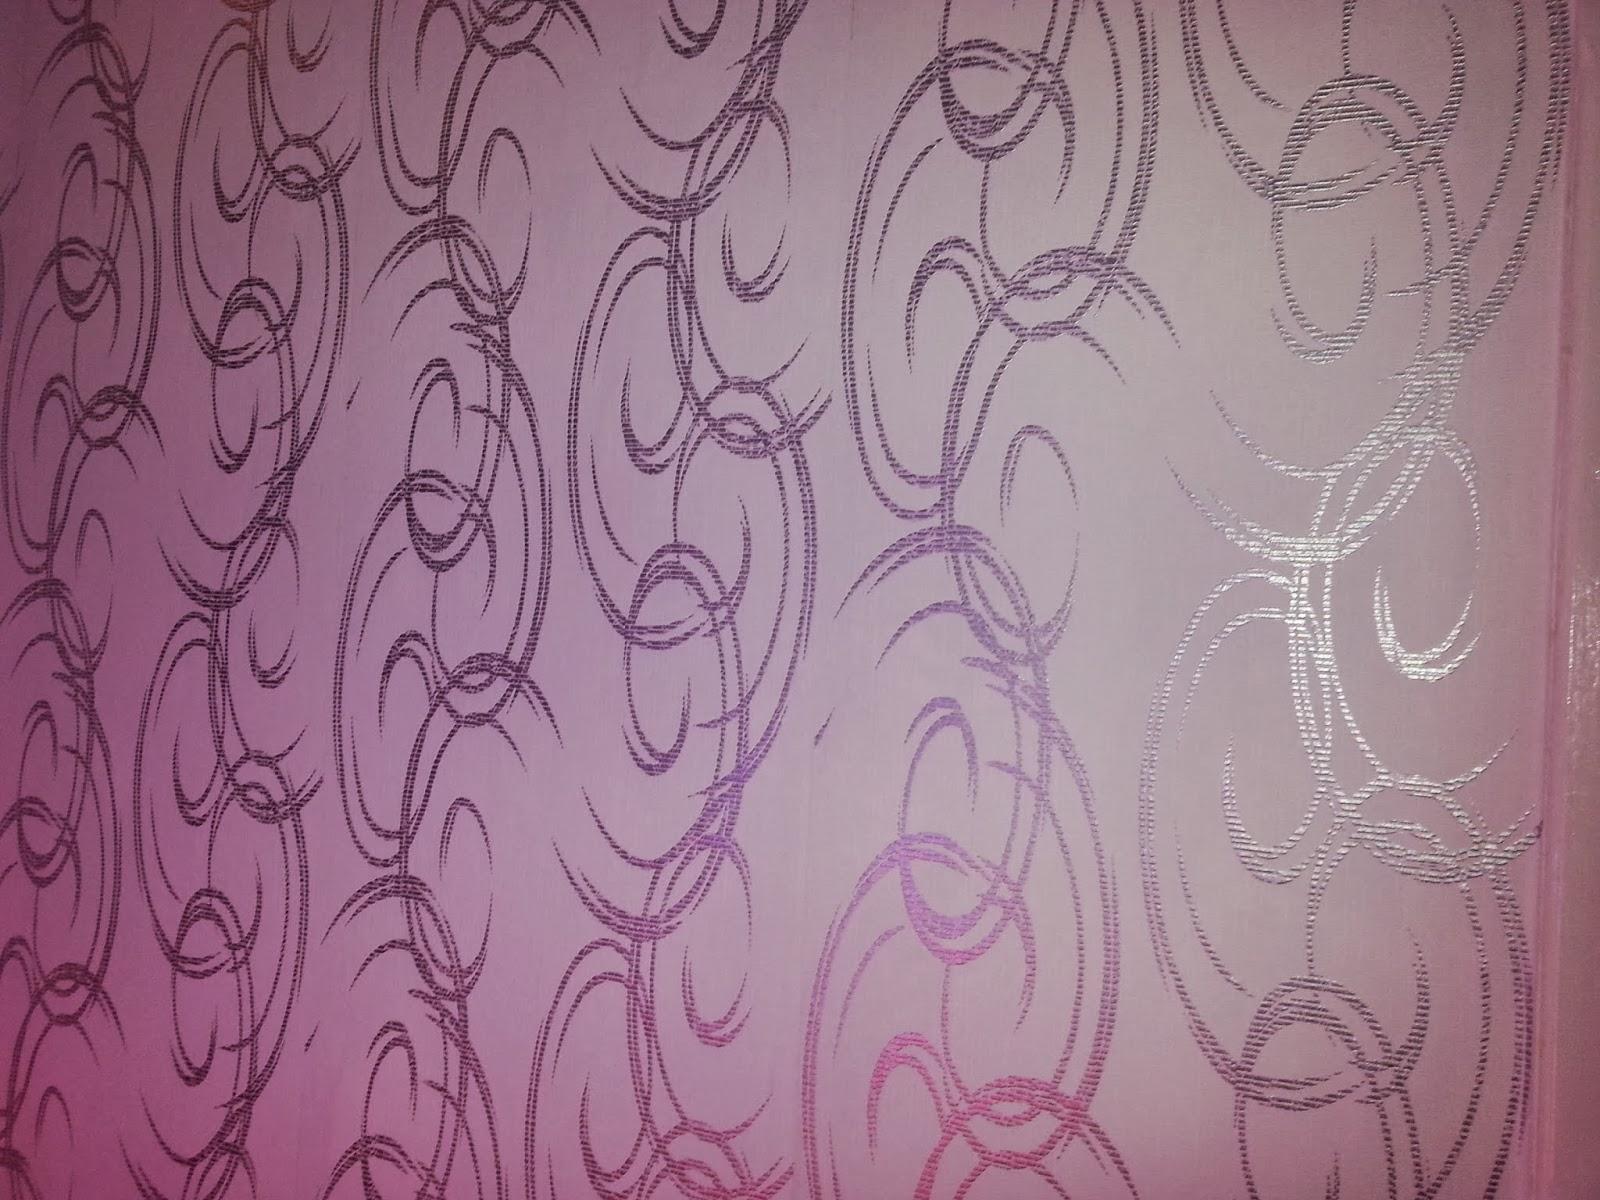 miss glitzer s testblog rasch tapeten. Black Bedroom Furniture Sets. Home Design Ideas